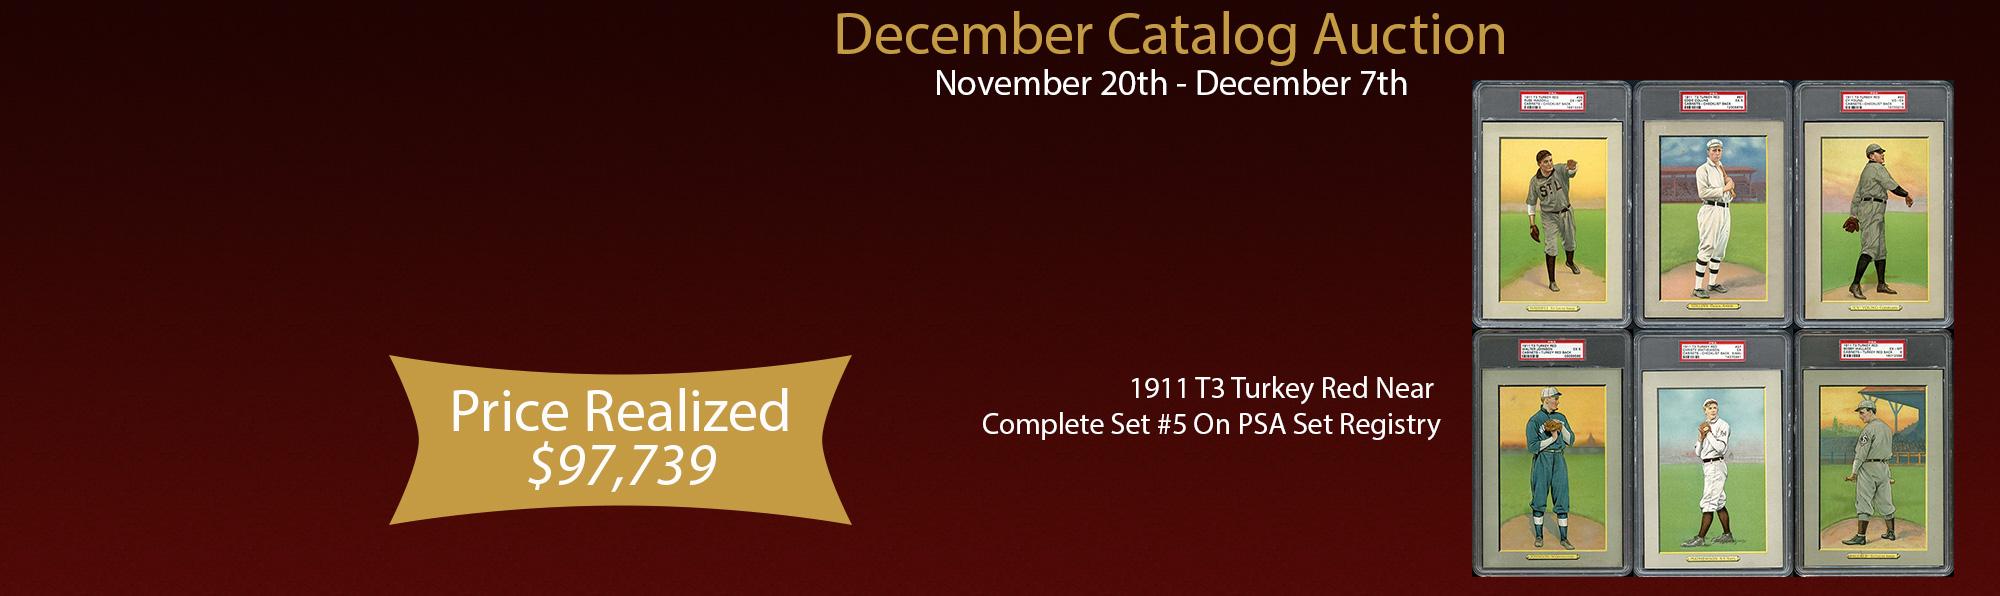 1911 T3 Turkey Red Near Complete Set #5 On PSA Set Registry